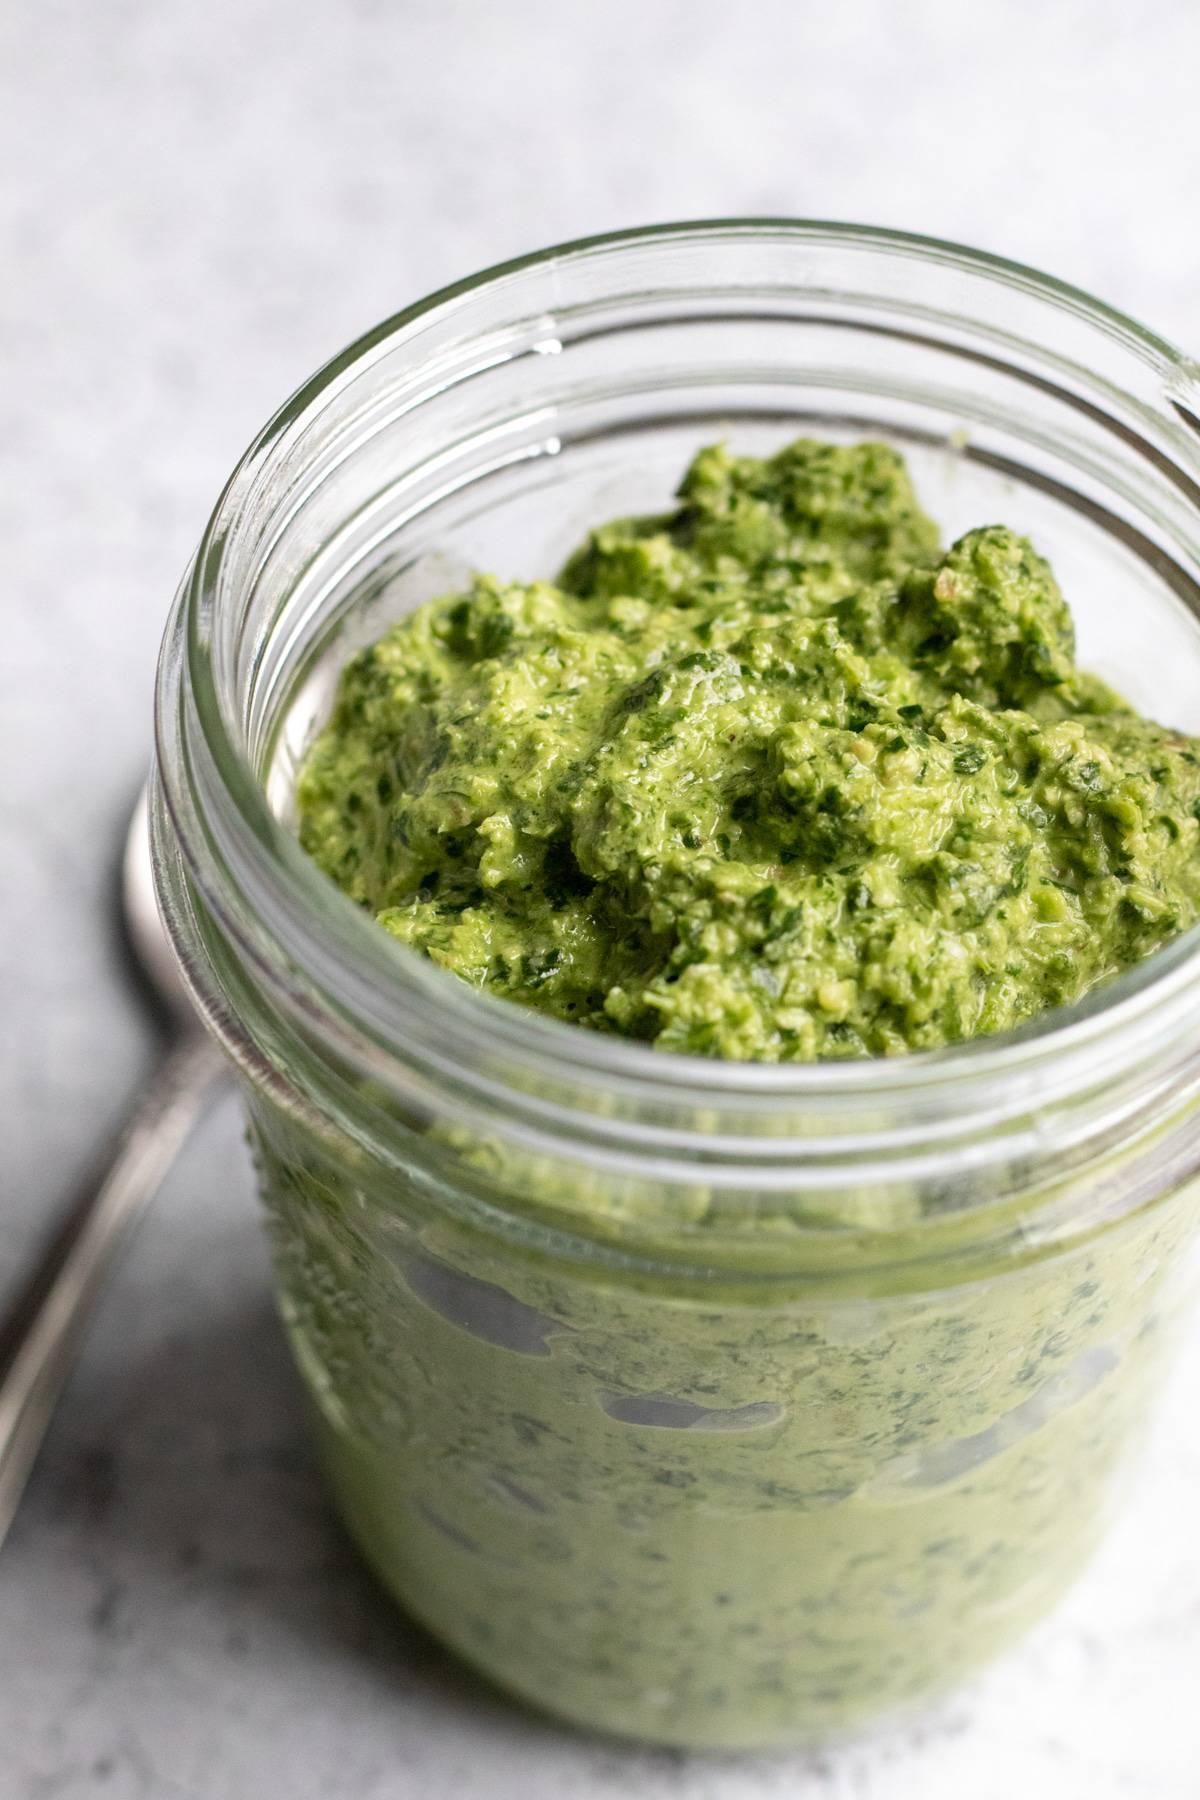 colorful green pesto in a glass jar